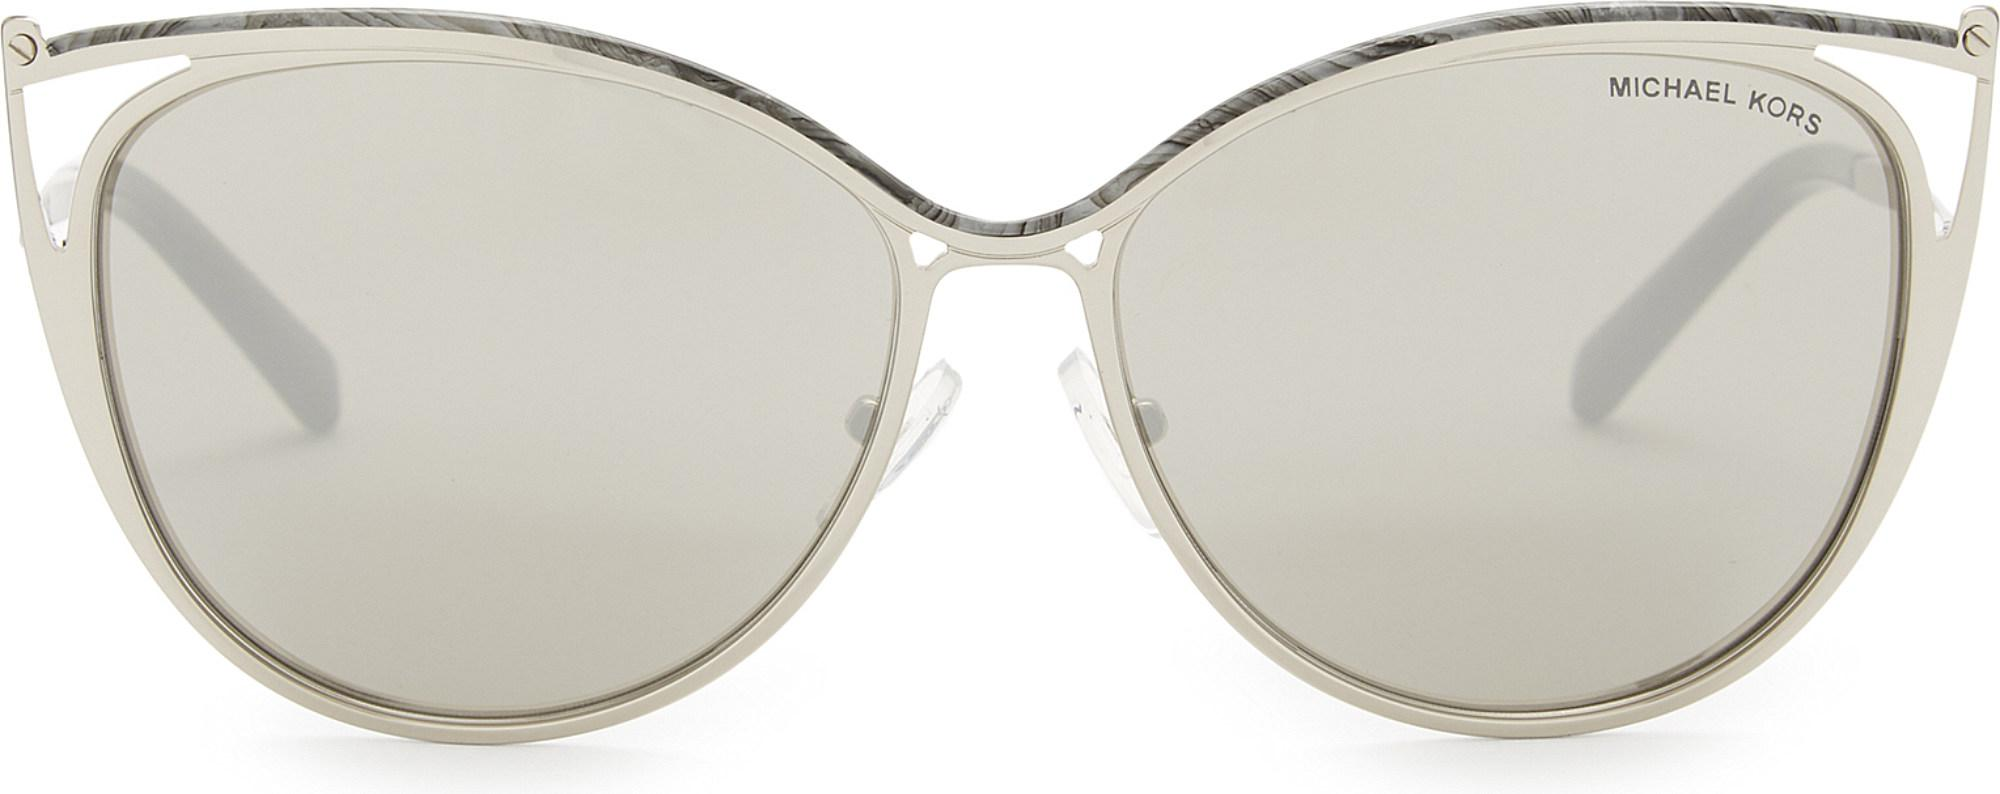 e4ea33f769274 Lyst - Michael Kors Mk1020 Cat-eye Sunglasses in Gray